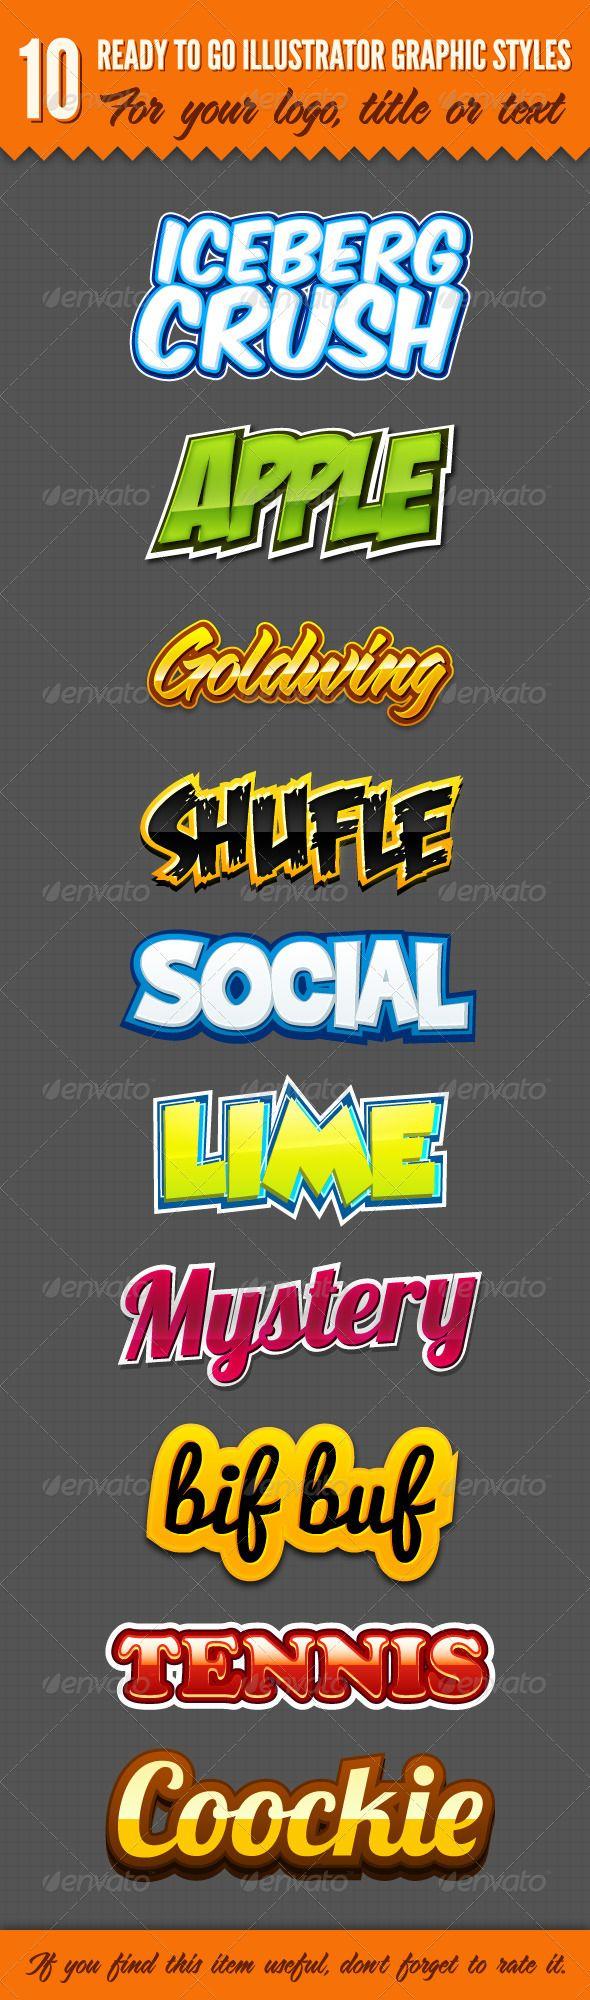 10 Logo Graphic Styles - Styles Illustrator